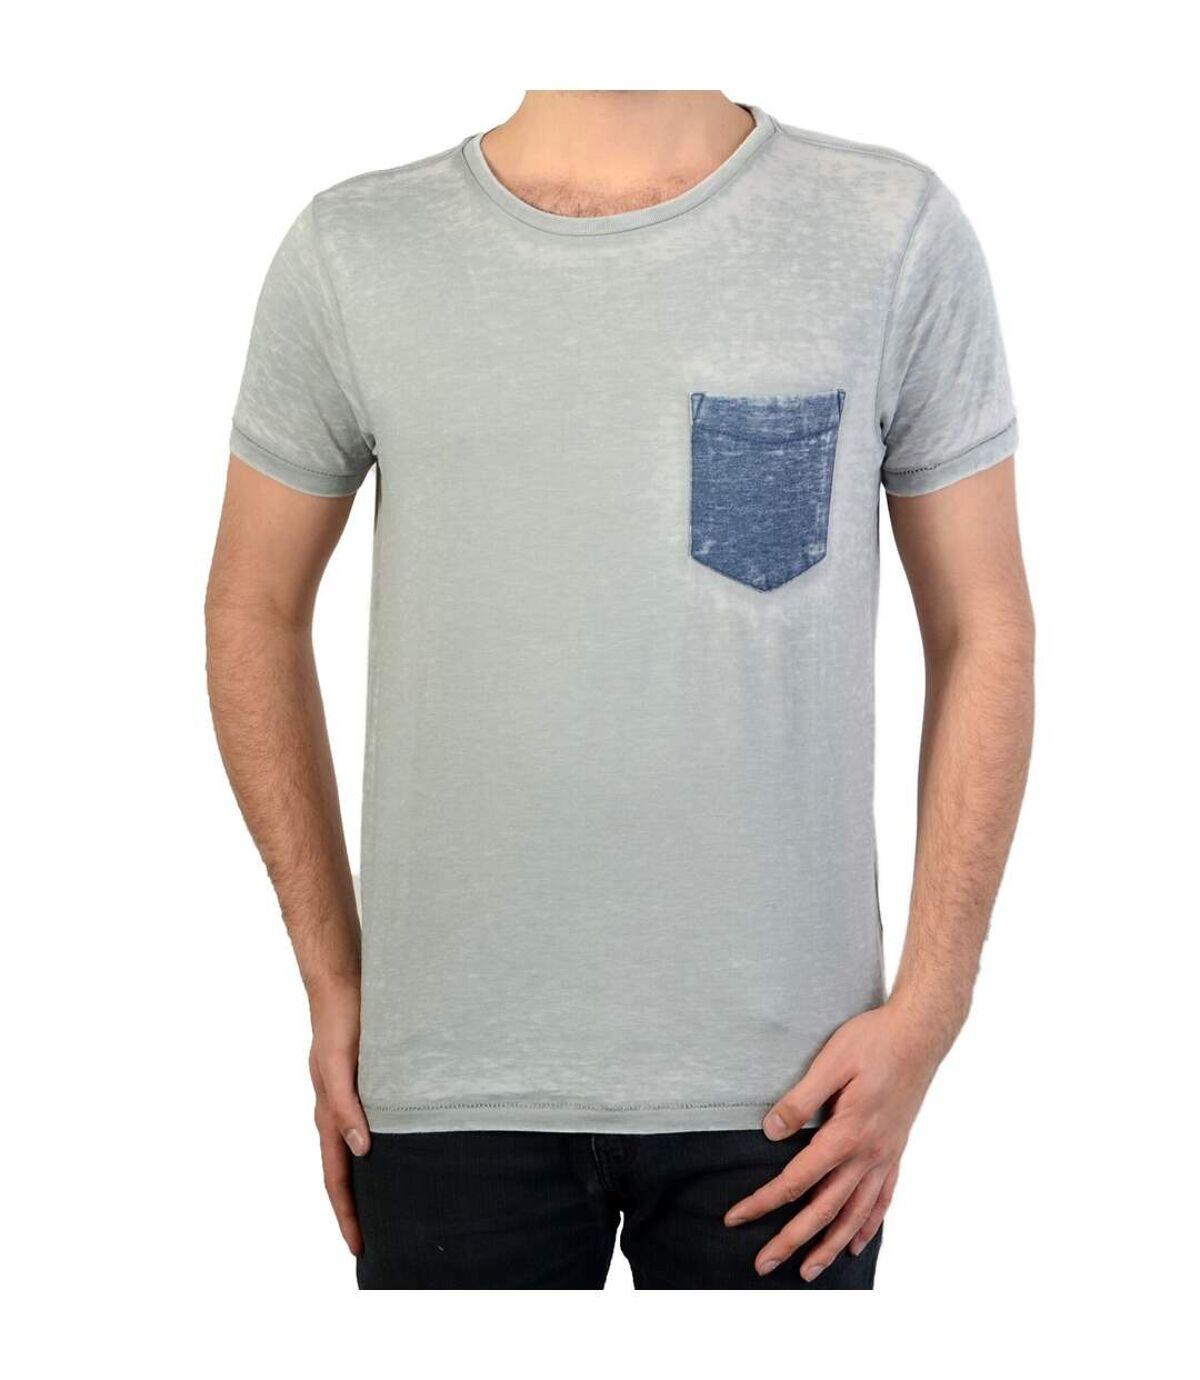 T-Shirt Petrol Industries Iron